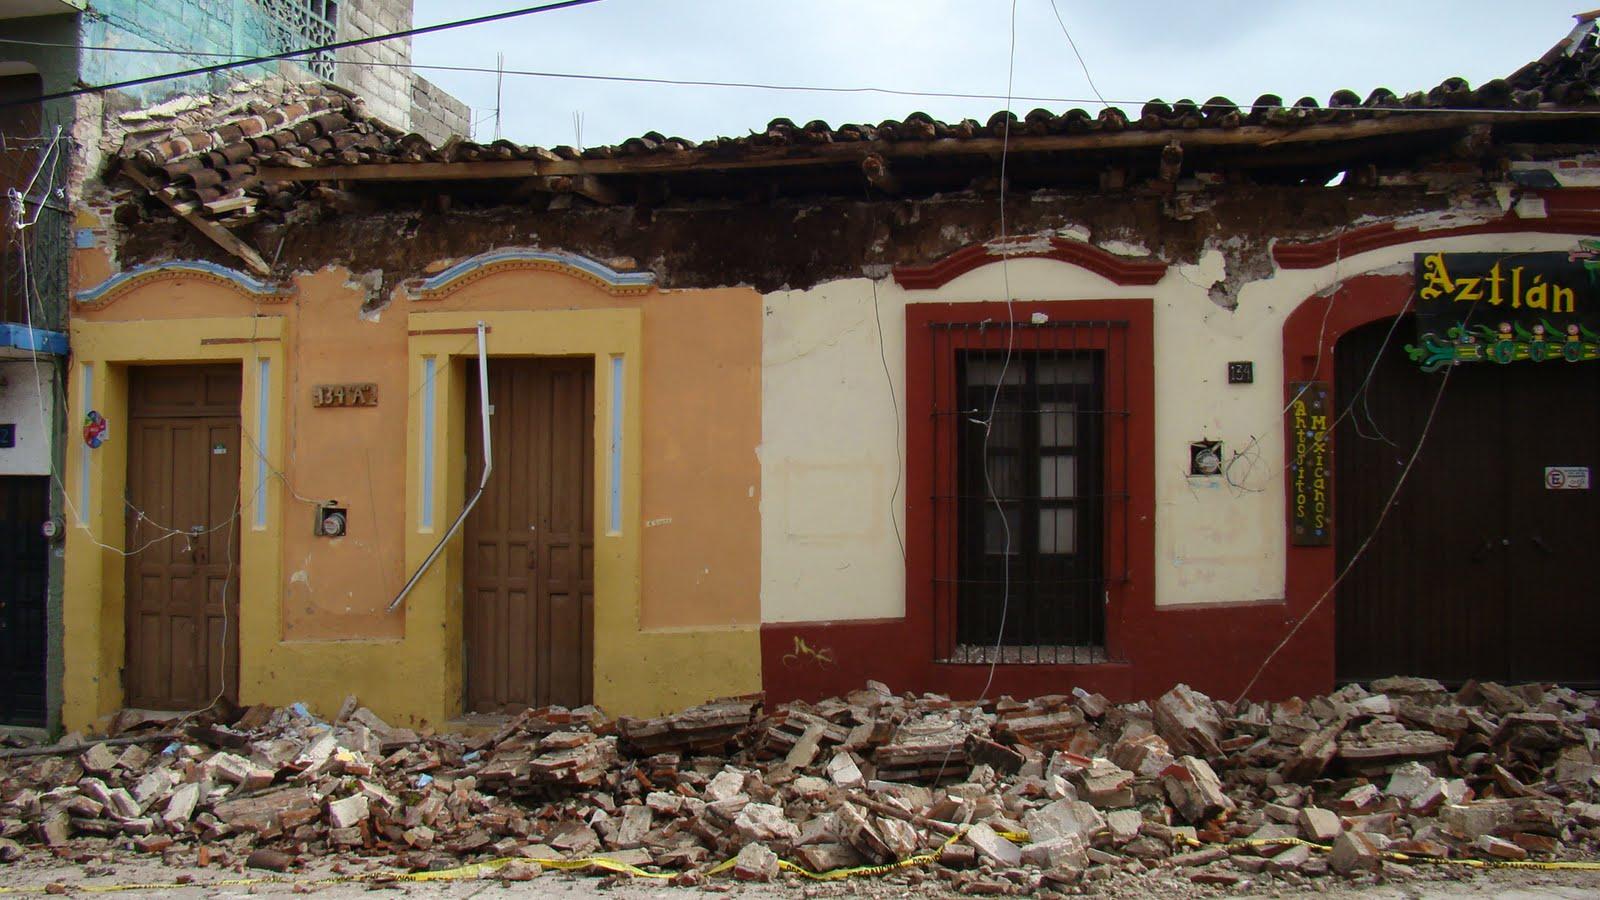 Di Caen Fachadas De Casas Antiguas Del Andador Guadalupano Por - Fachadas-antiguas-de-casas